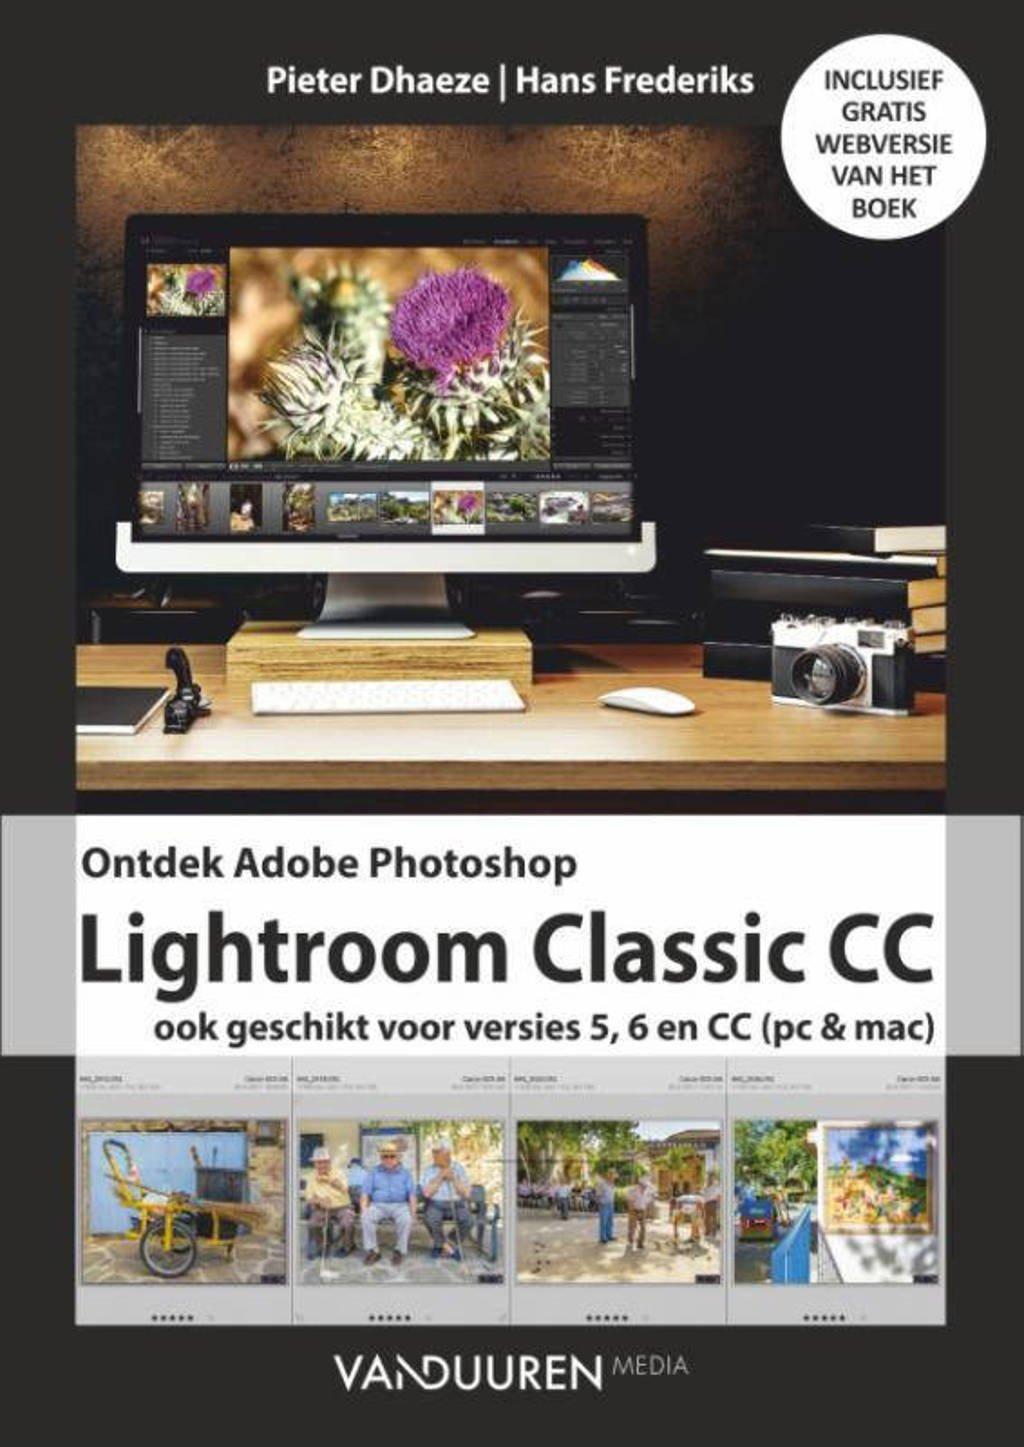 Ontdek: Ontdek Adobe Photoshopp Lightroom Classic CC - Pieter Dhaeze en Hans Frederiks